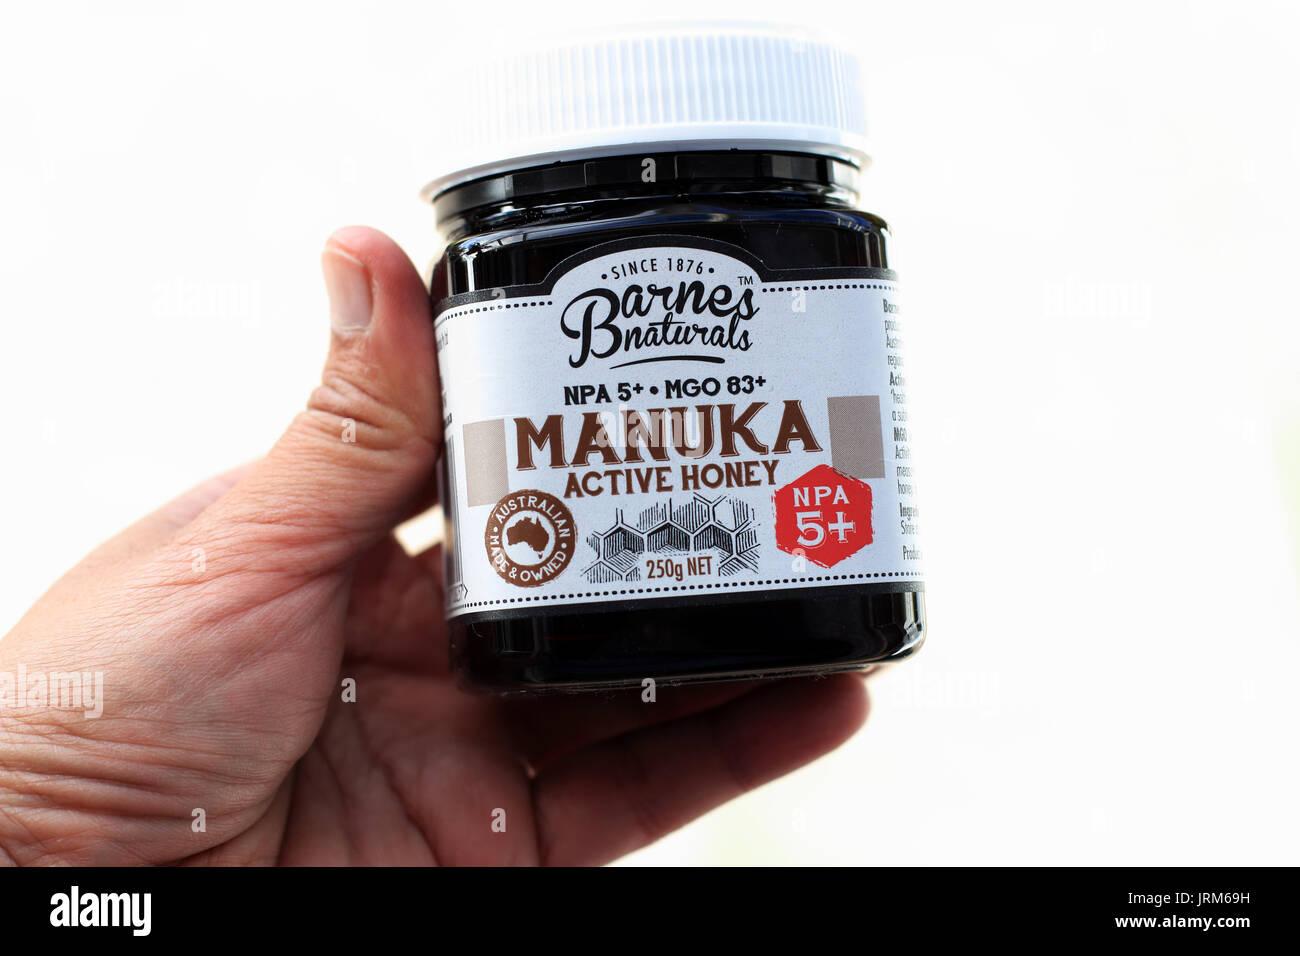 Barnes Naturals Miel de Manuka australienne Photo Stock